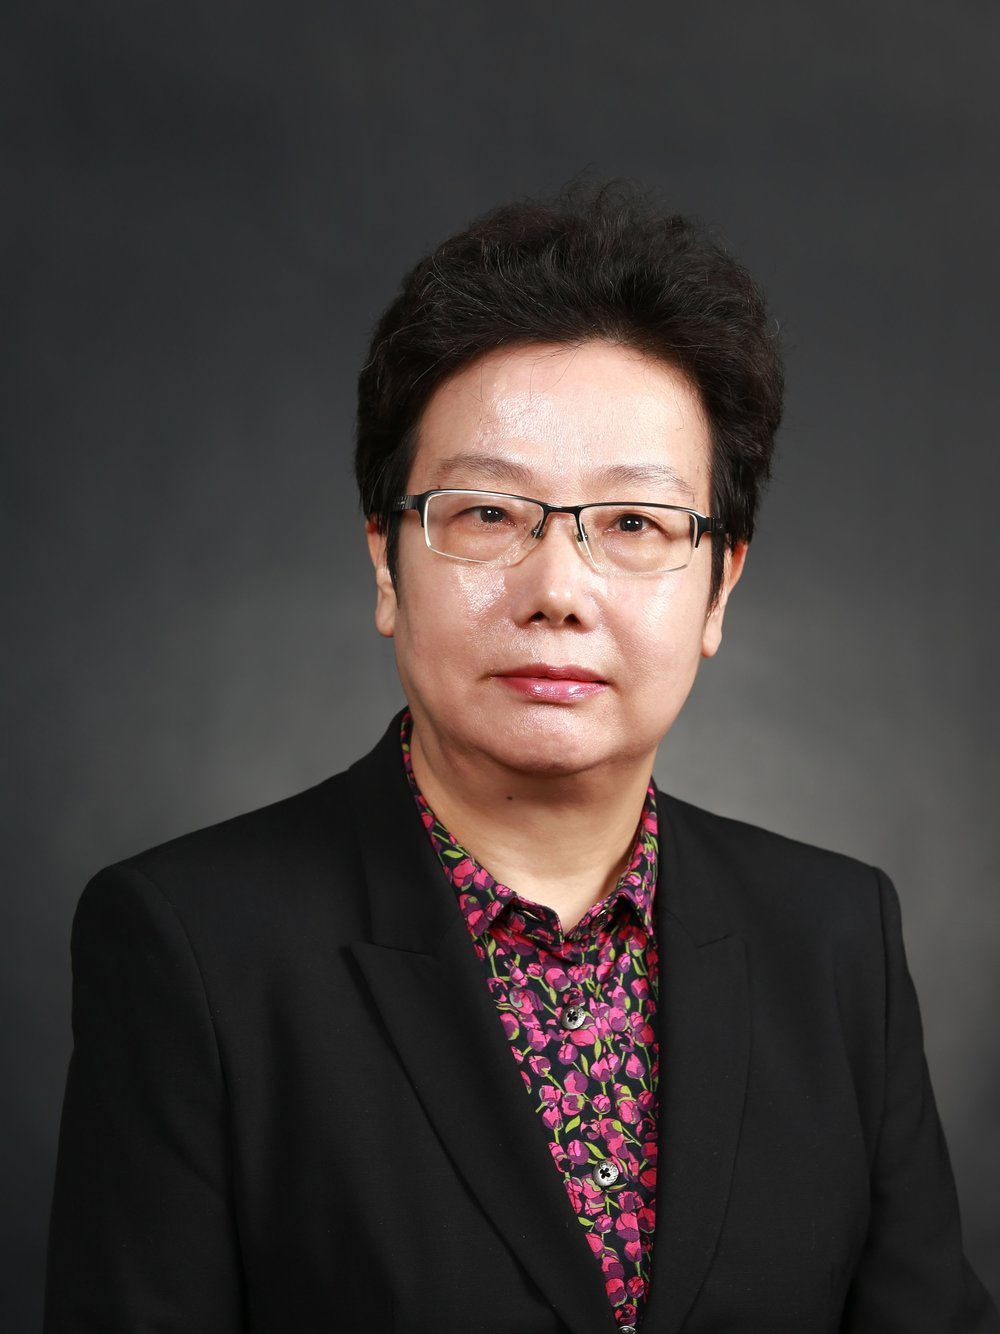 Jiang FengJiang Feng - President, China Household Electrical Appliances Association (CHEAA)